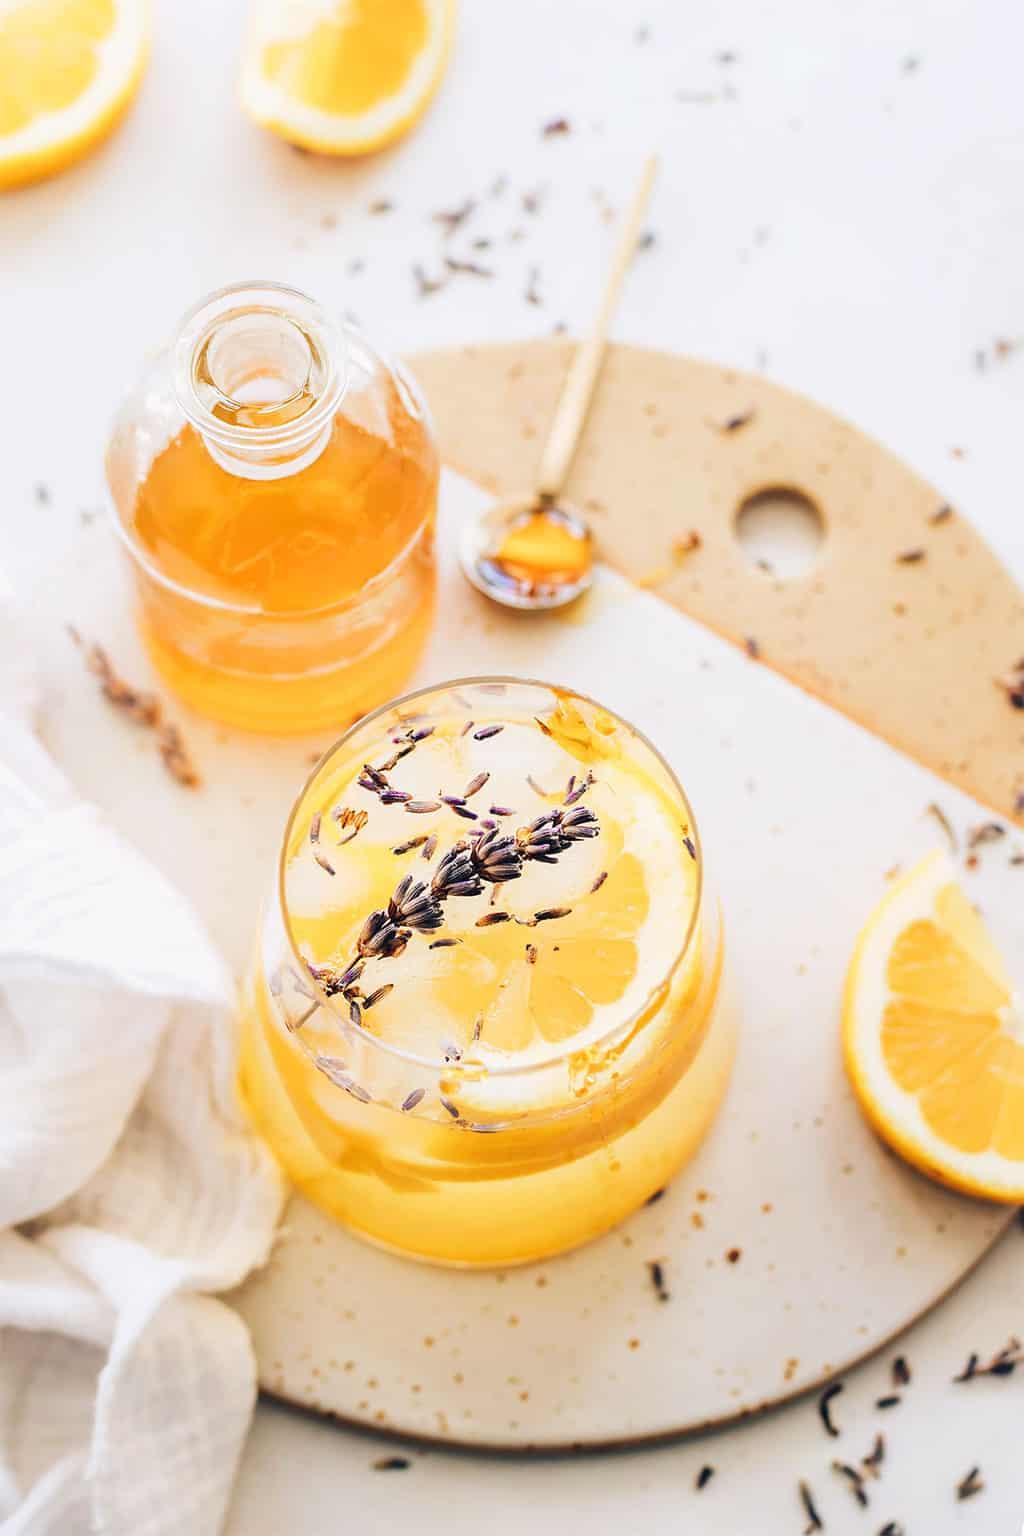 Resep Soda Limun Lavender